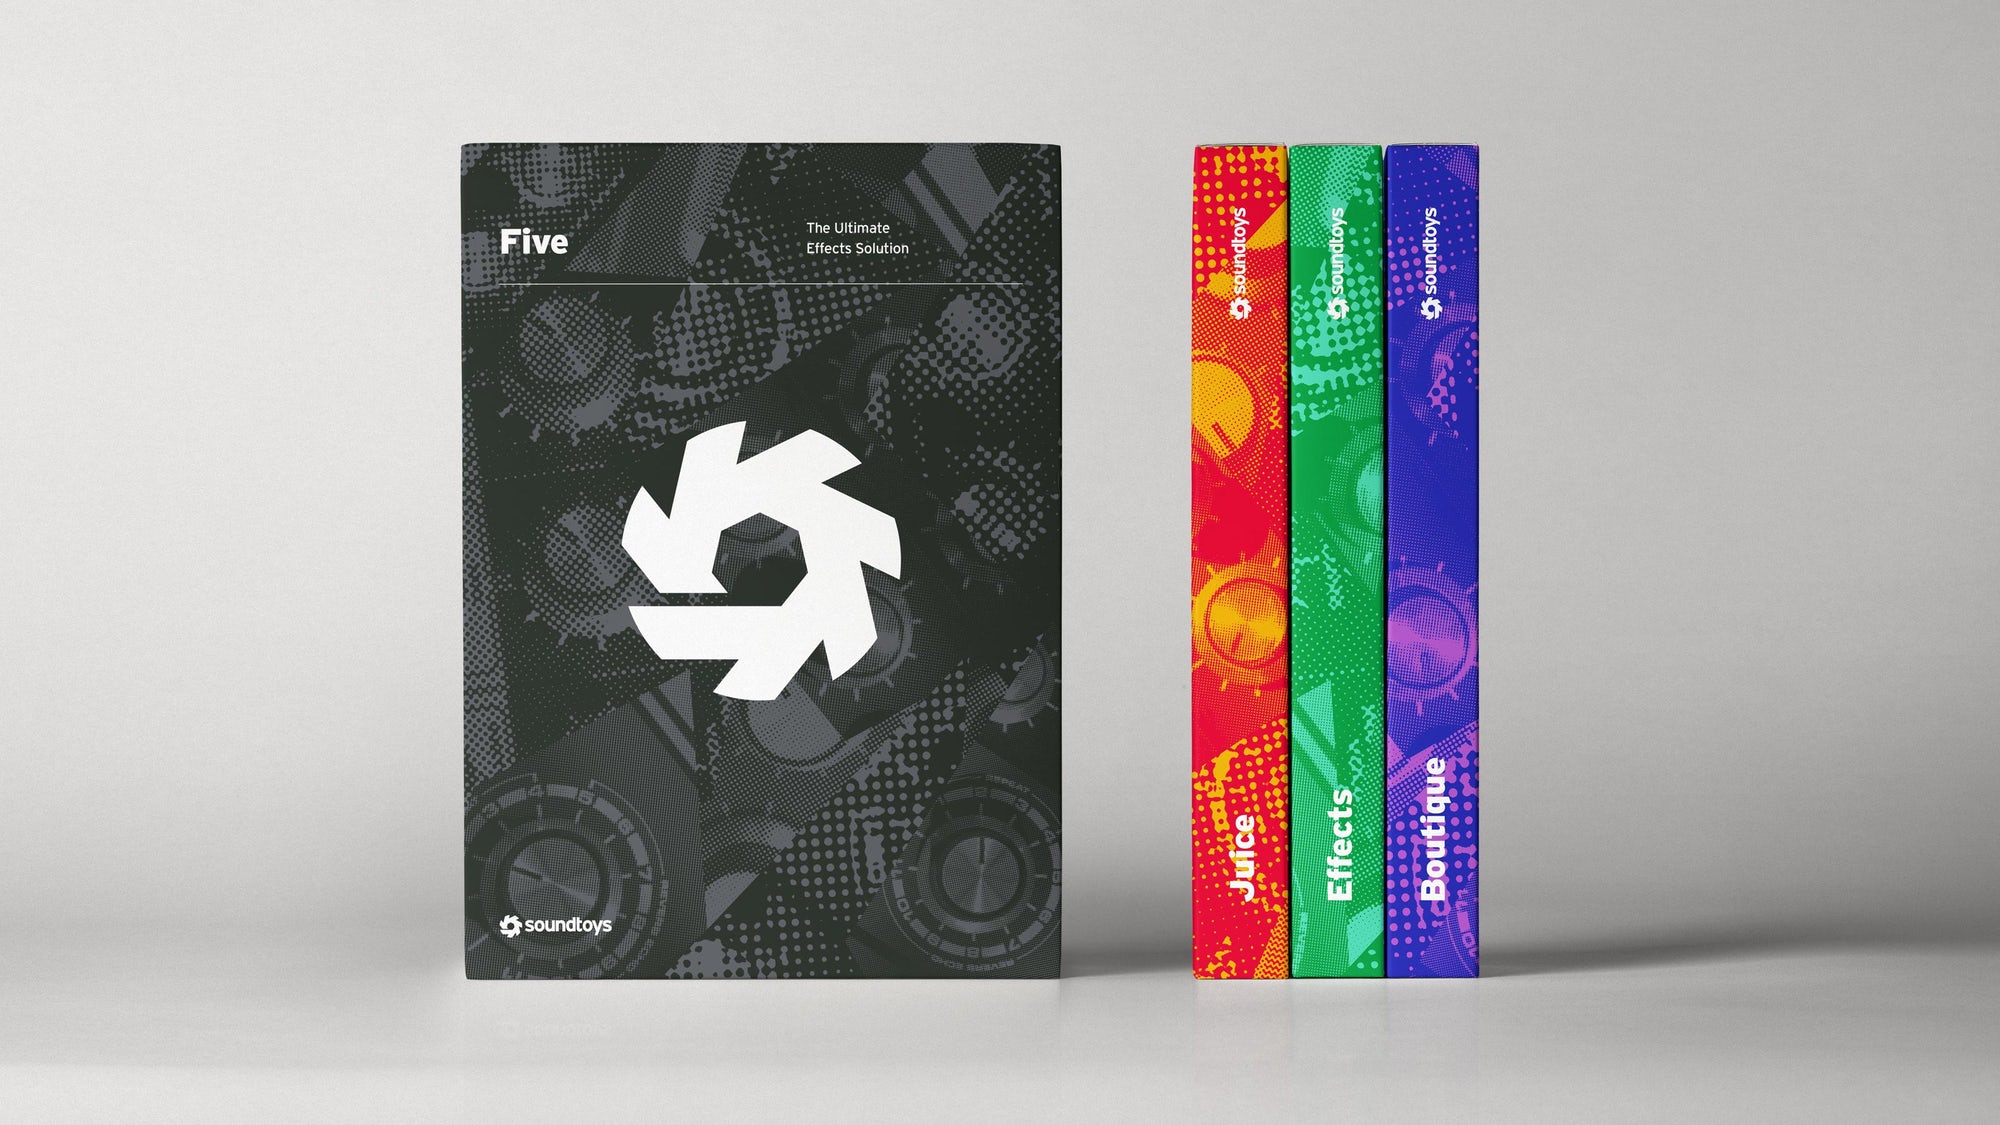 Soundtoys Packaging Design